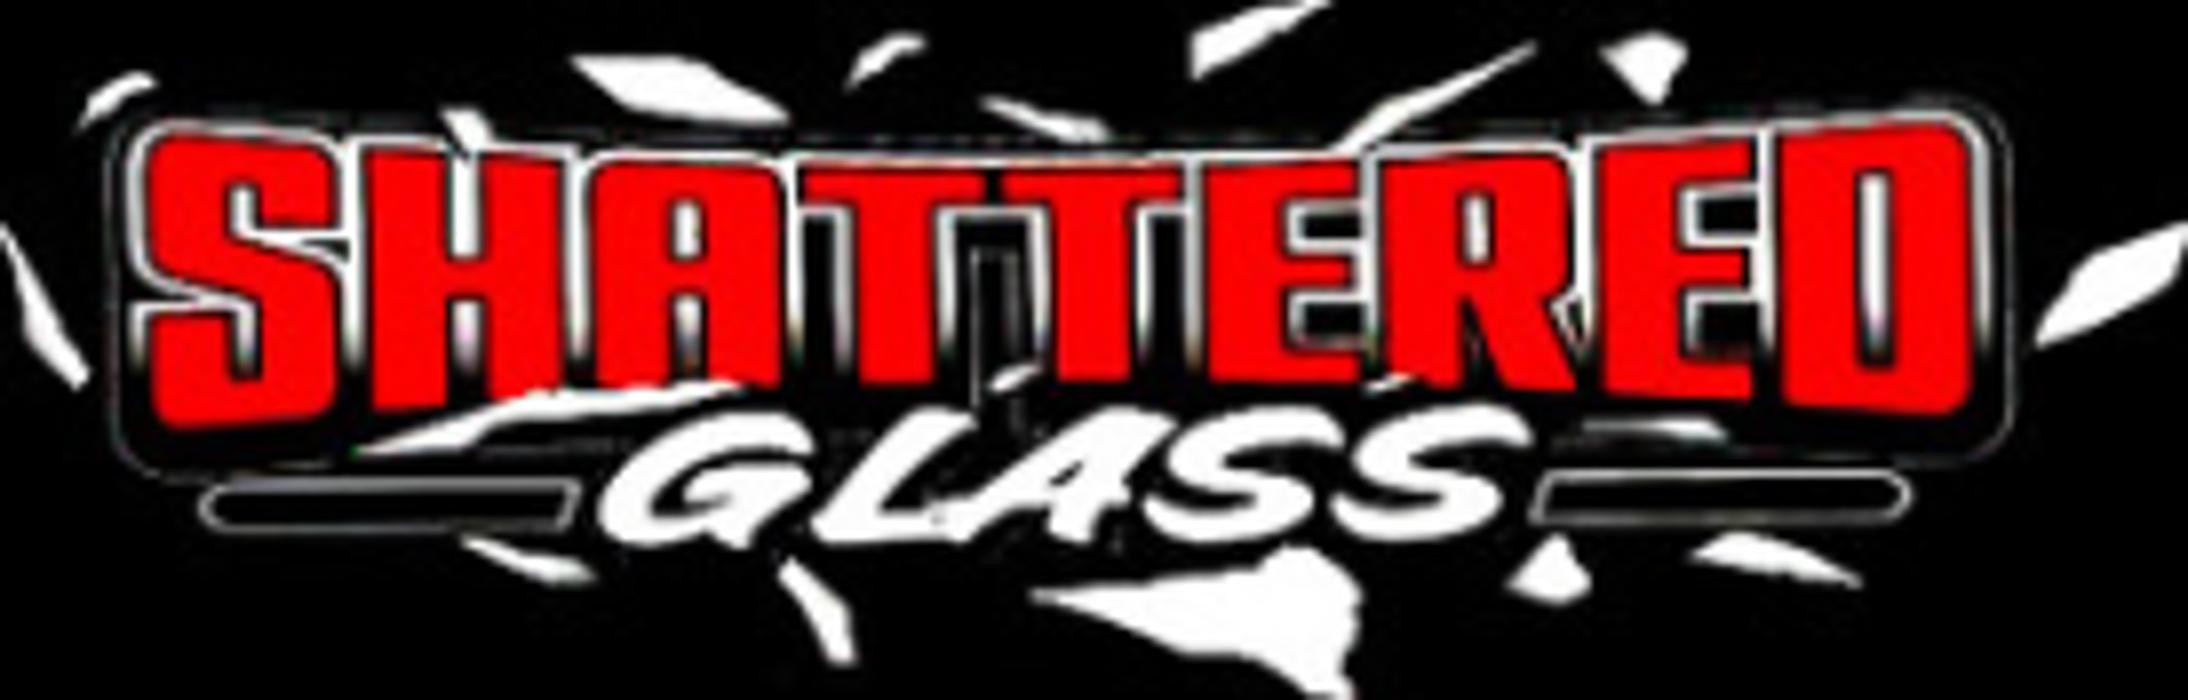 Shattered Glass - Marietta, GA